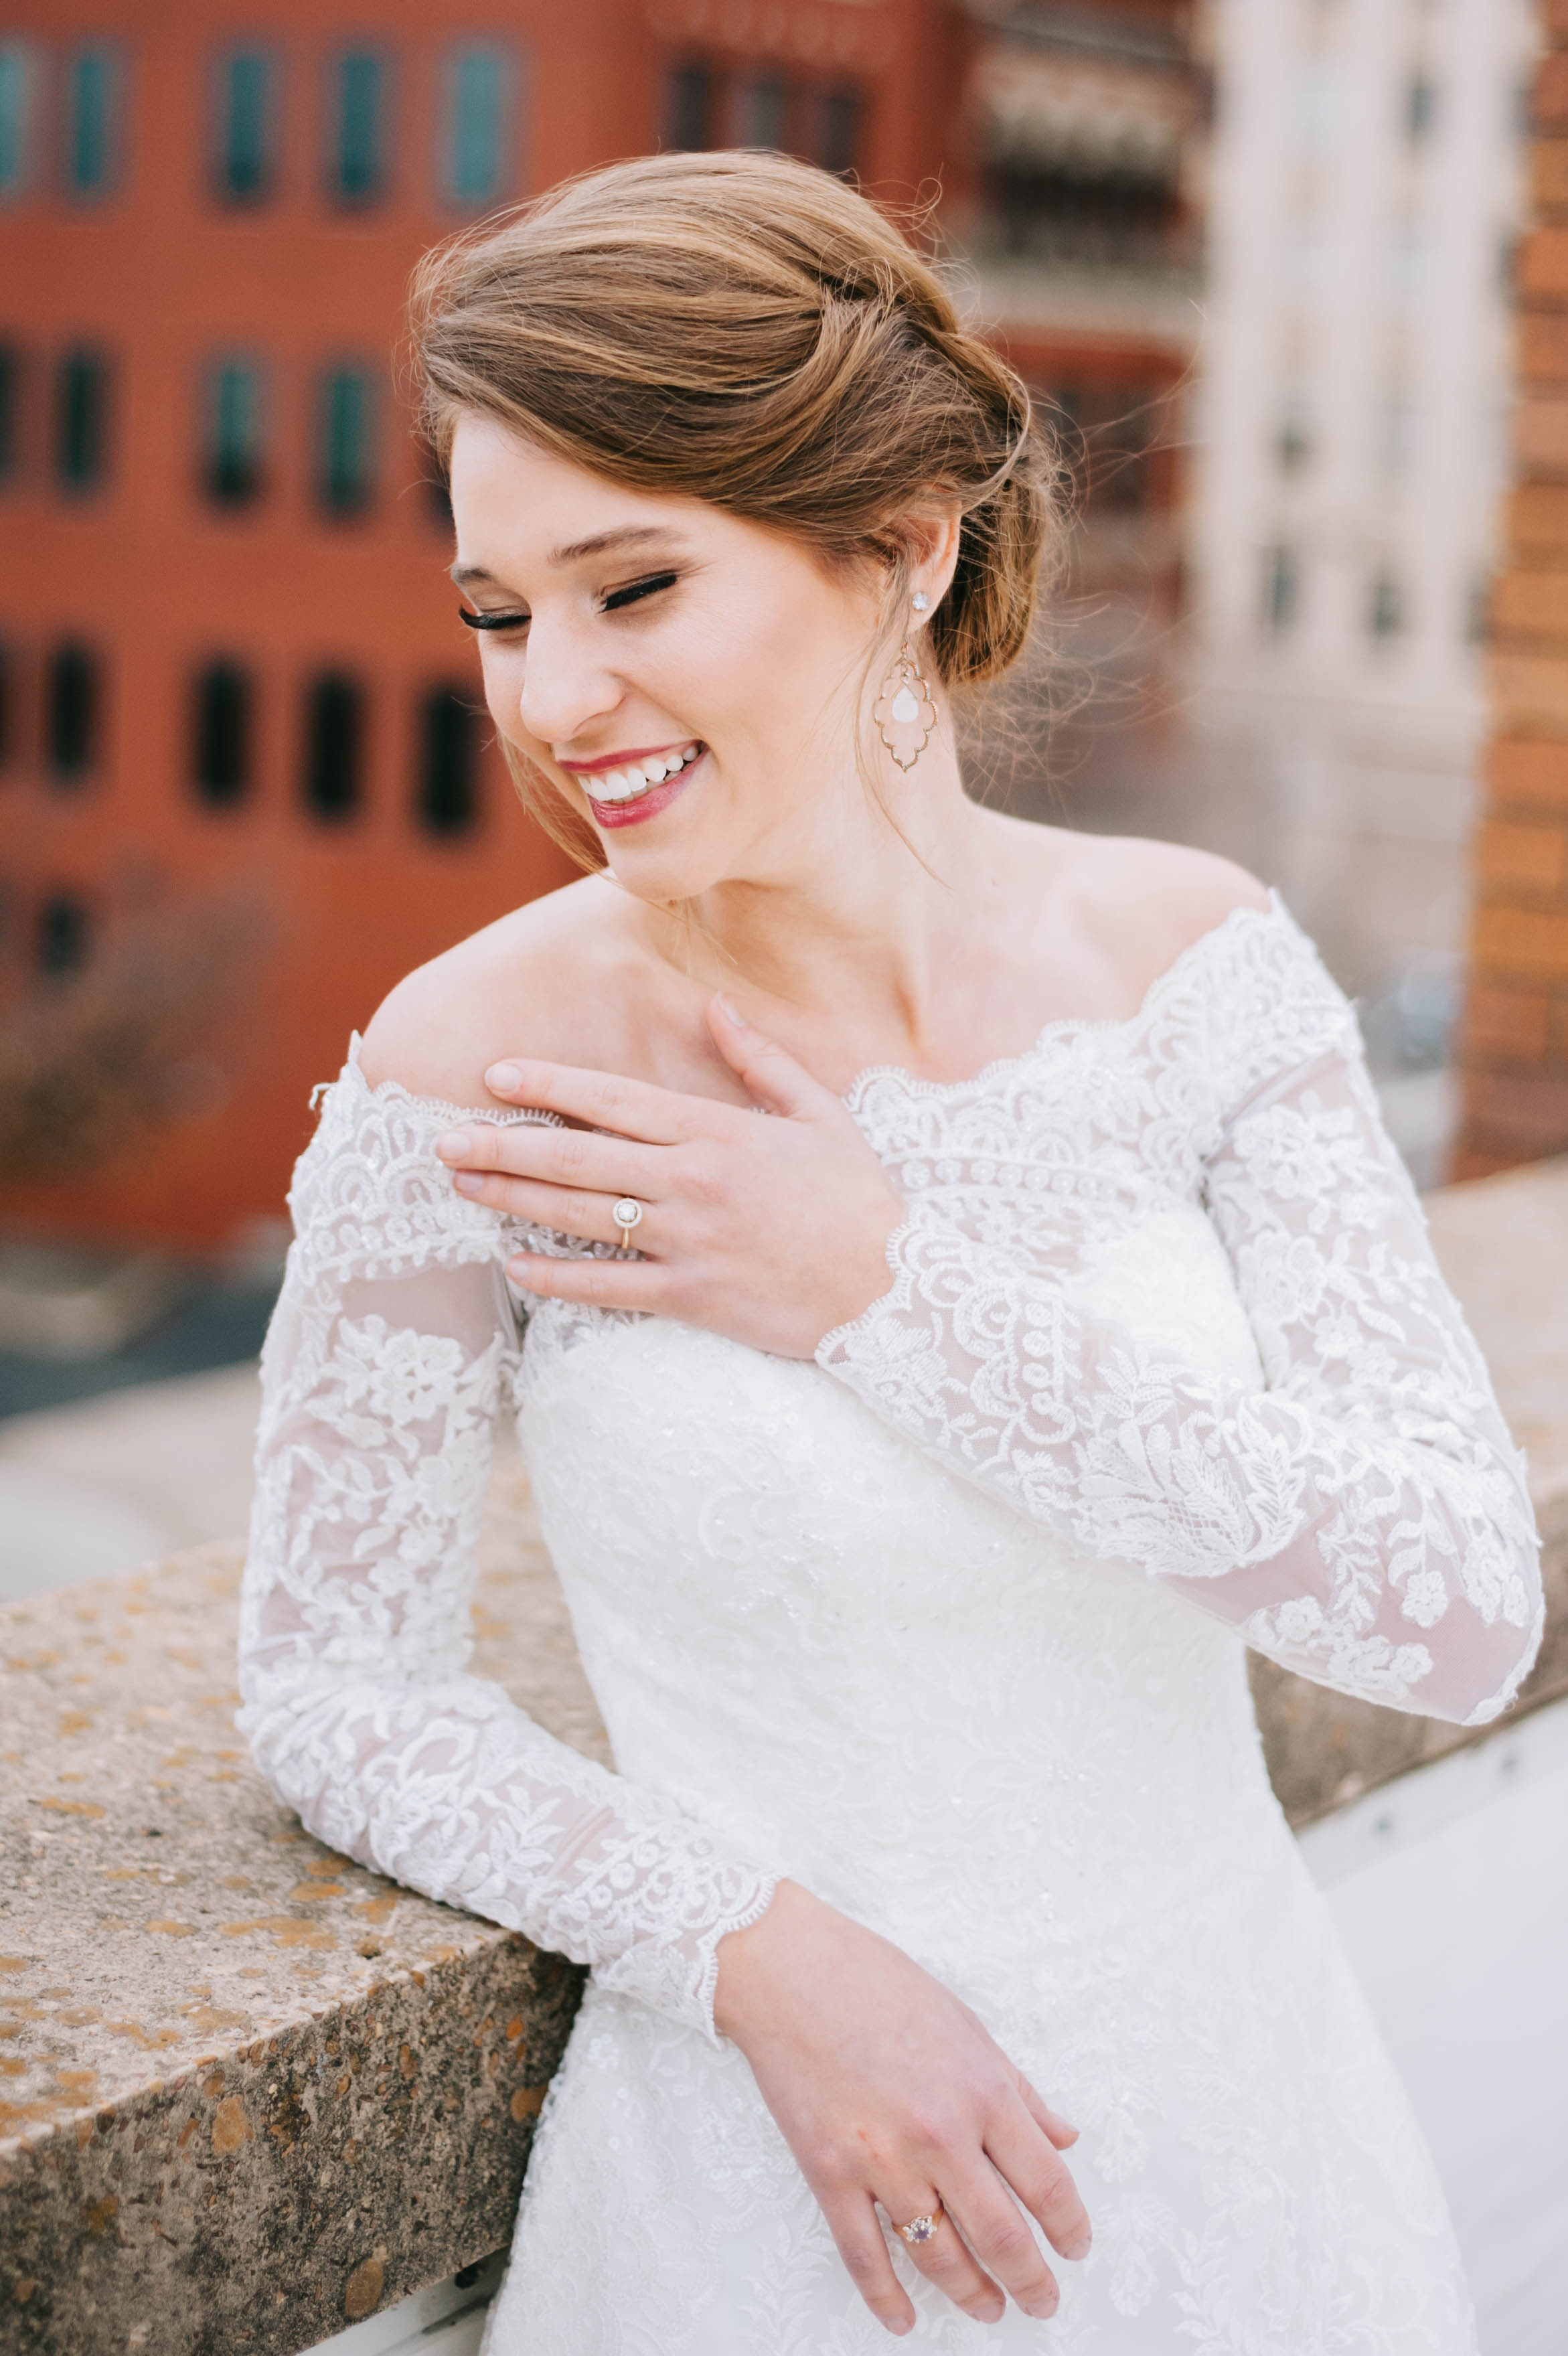 Hannah Steward Baskin | Bridals (73 of 74).jpg